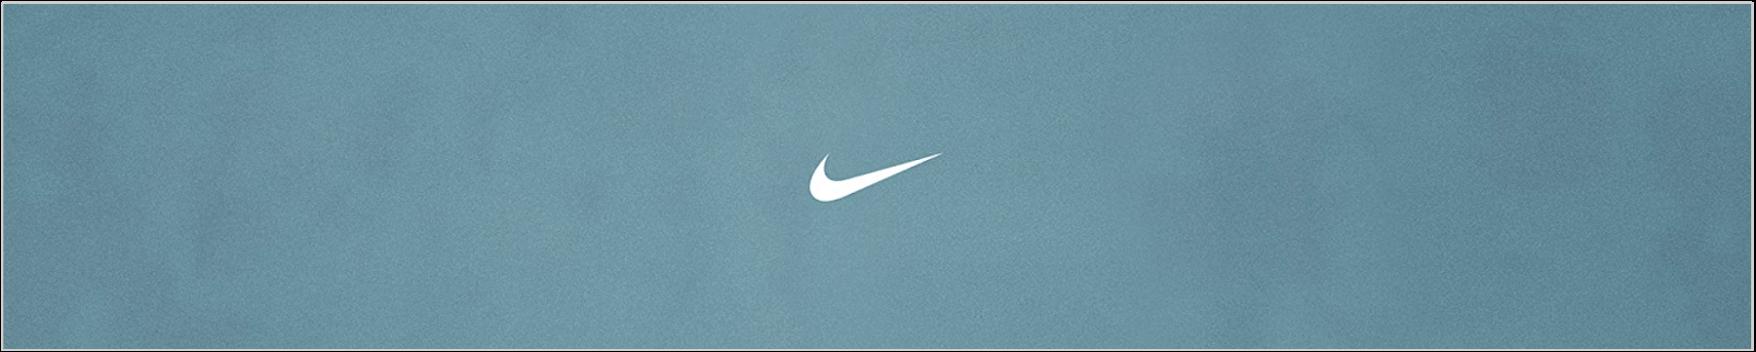 hero image of Nike's Amazon store